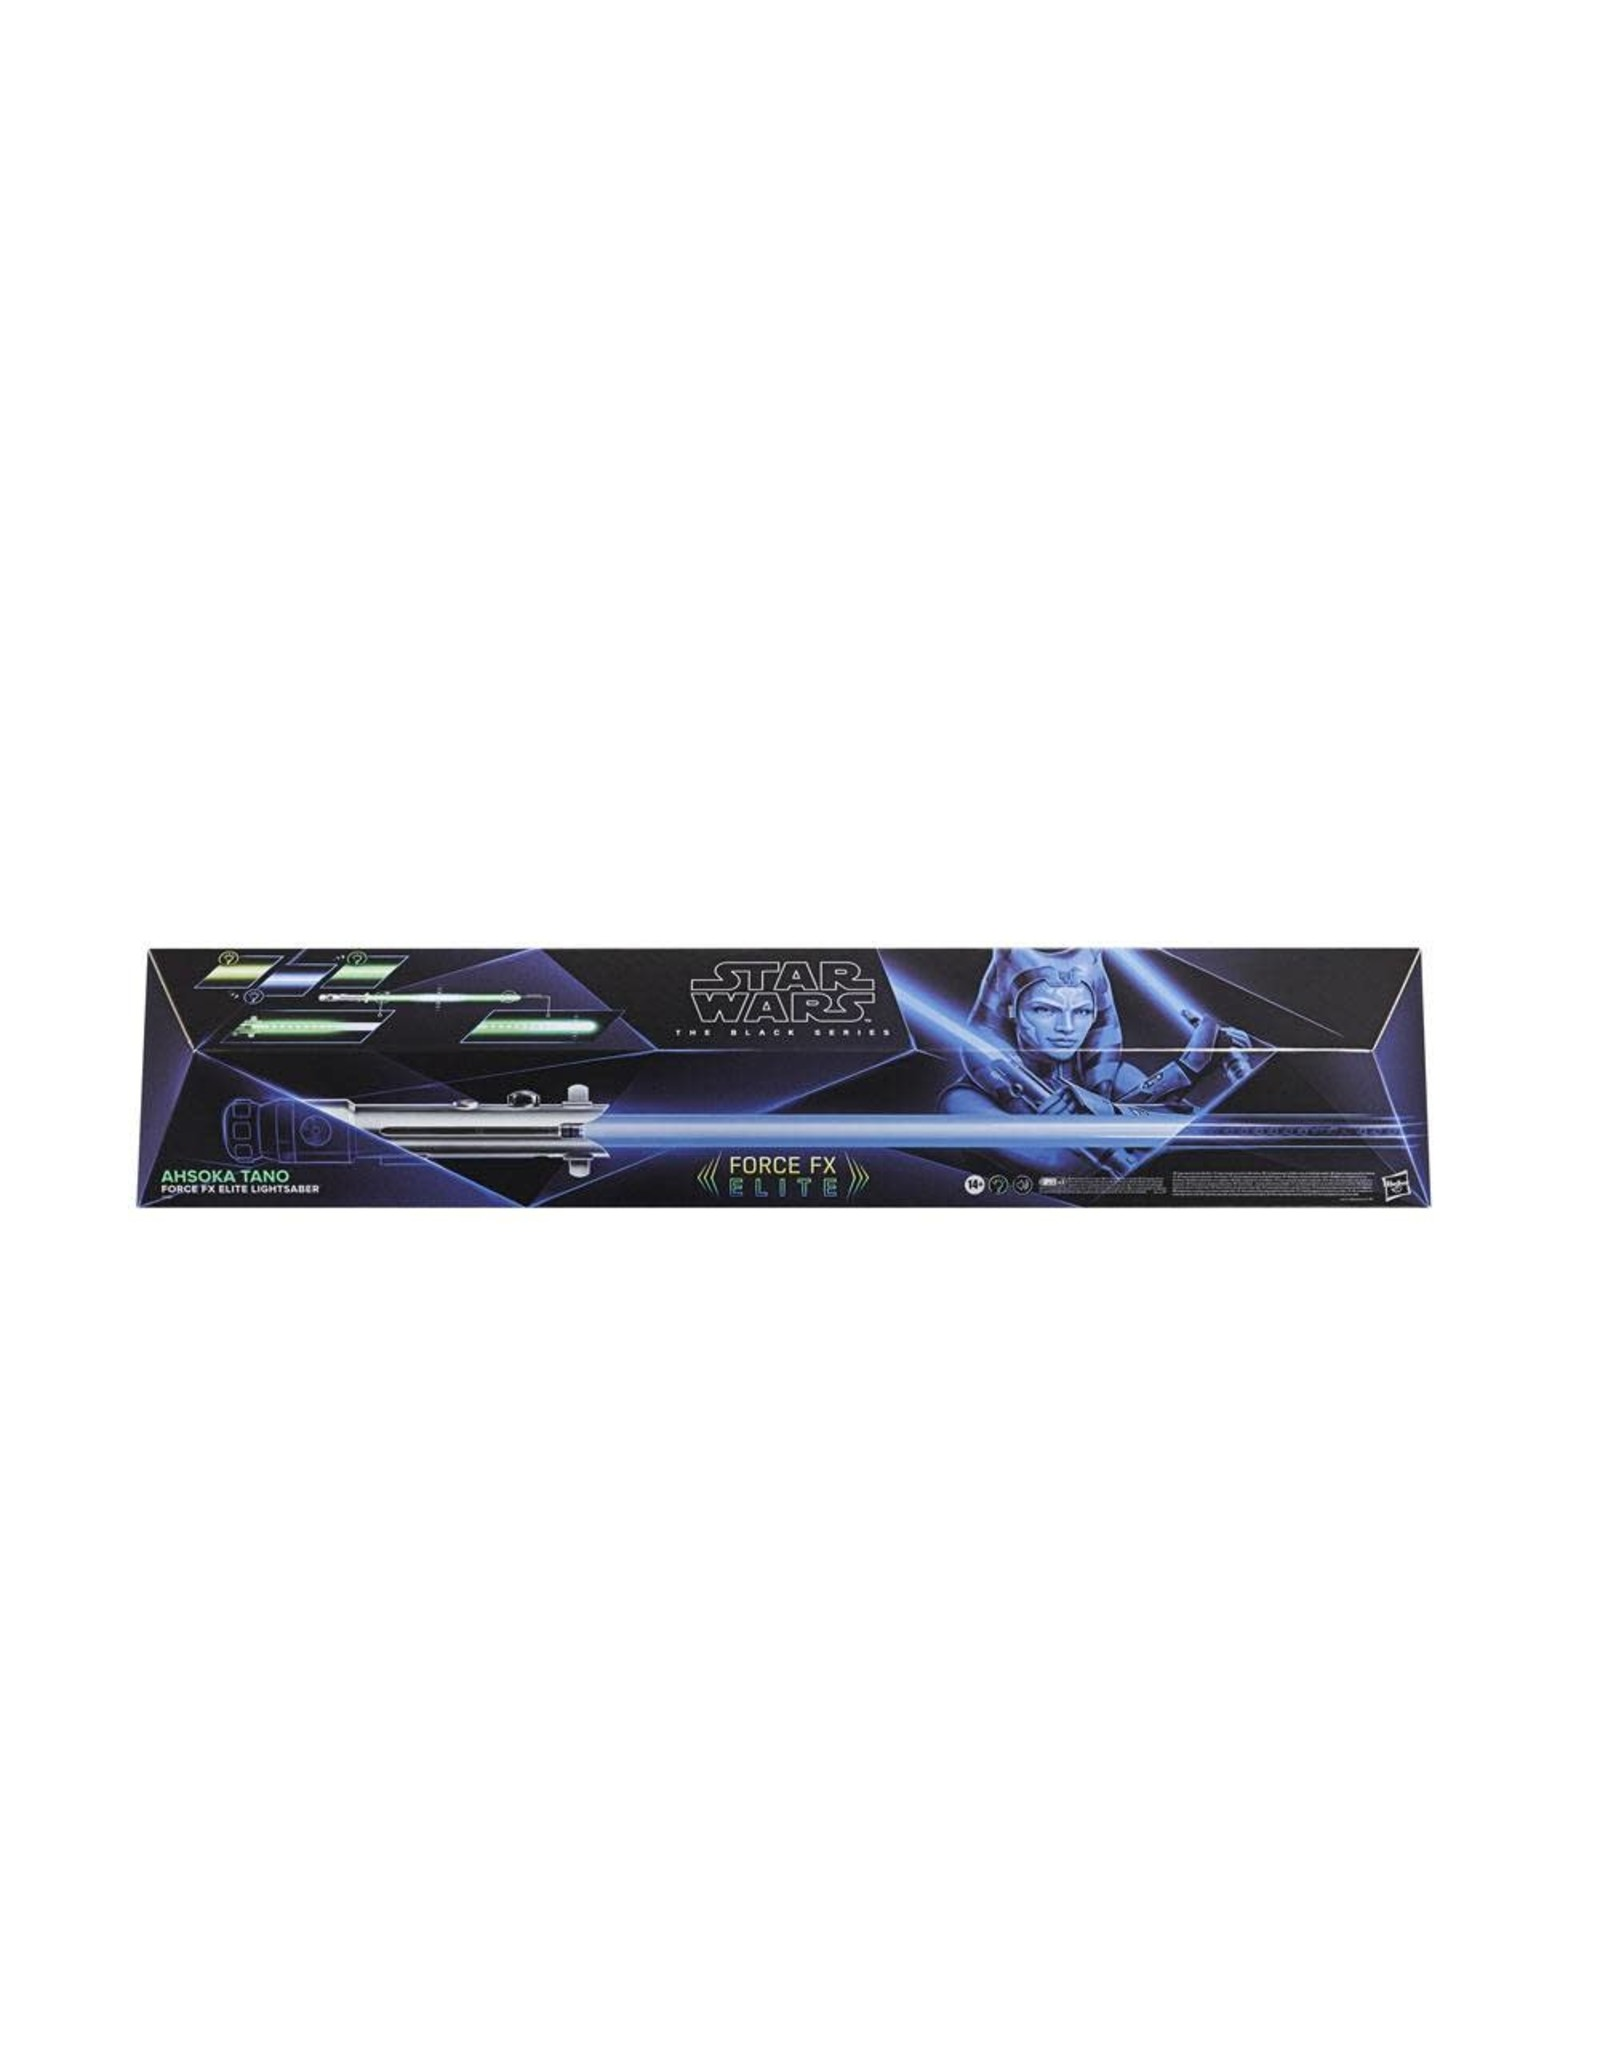 Hasbro STAR WARS The Black Series Replica 1/1 Force FX Elite Lightsaber - Ahsoka Tano